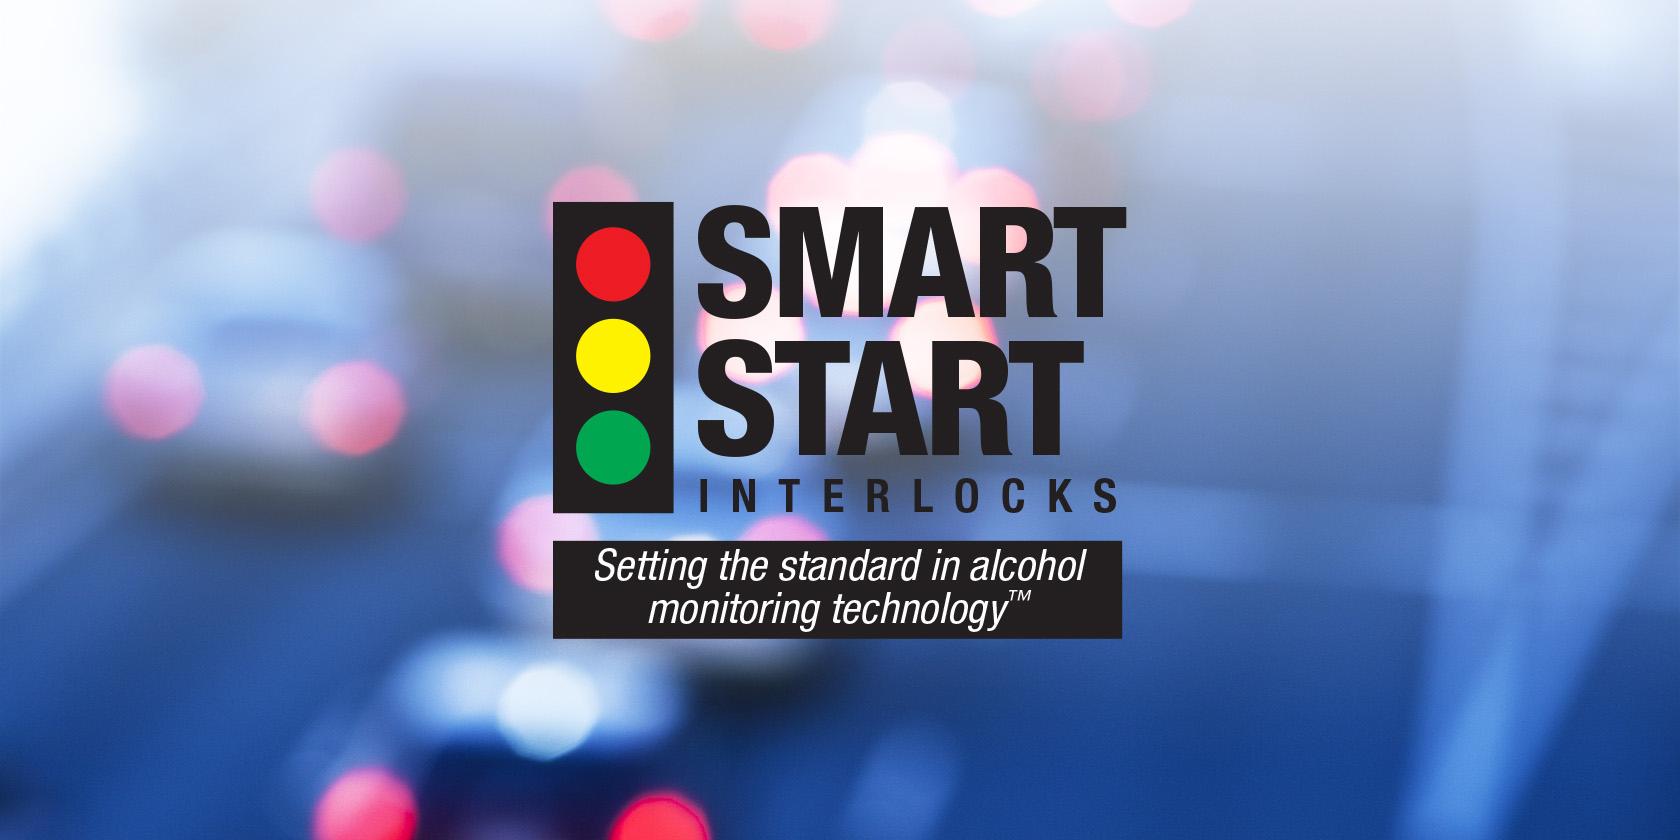 Smart Start Interlock Banners 0